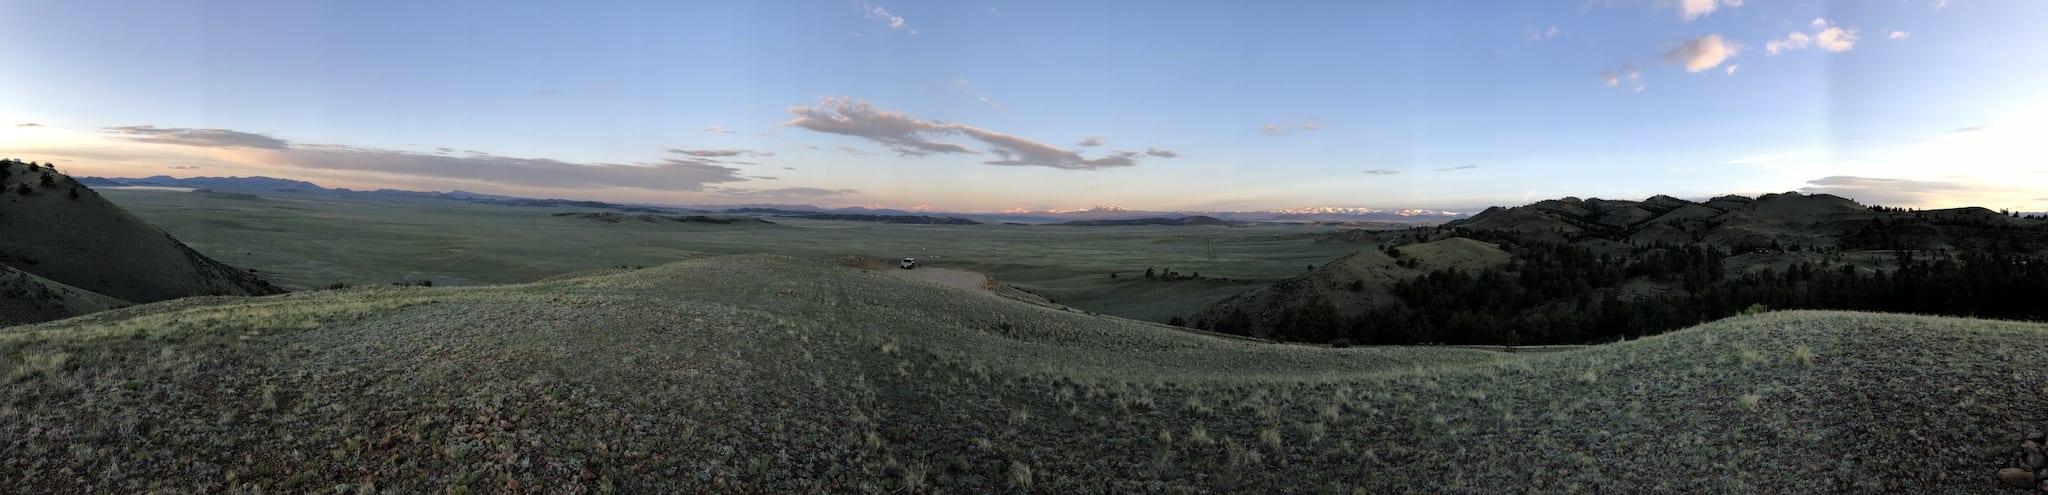 Hartsel Colorado Panorama Spinney Mountain Reservoir